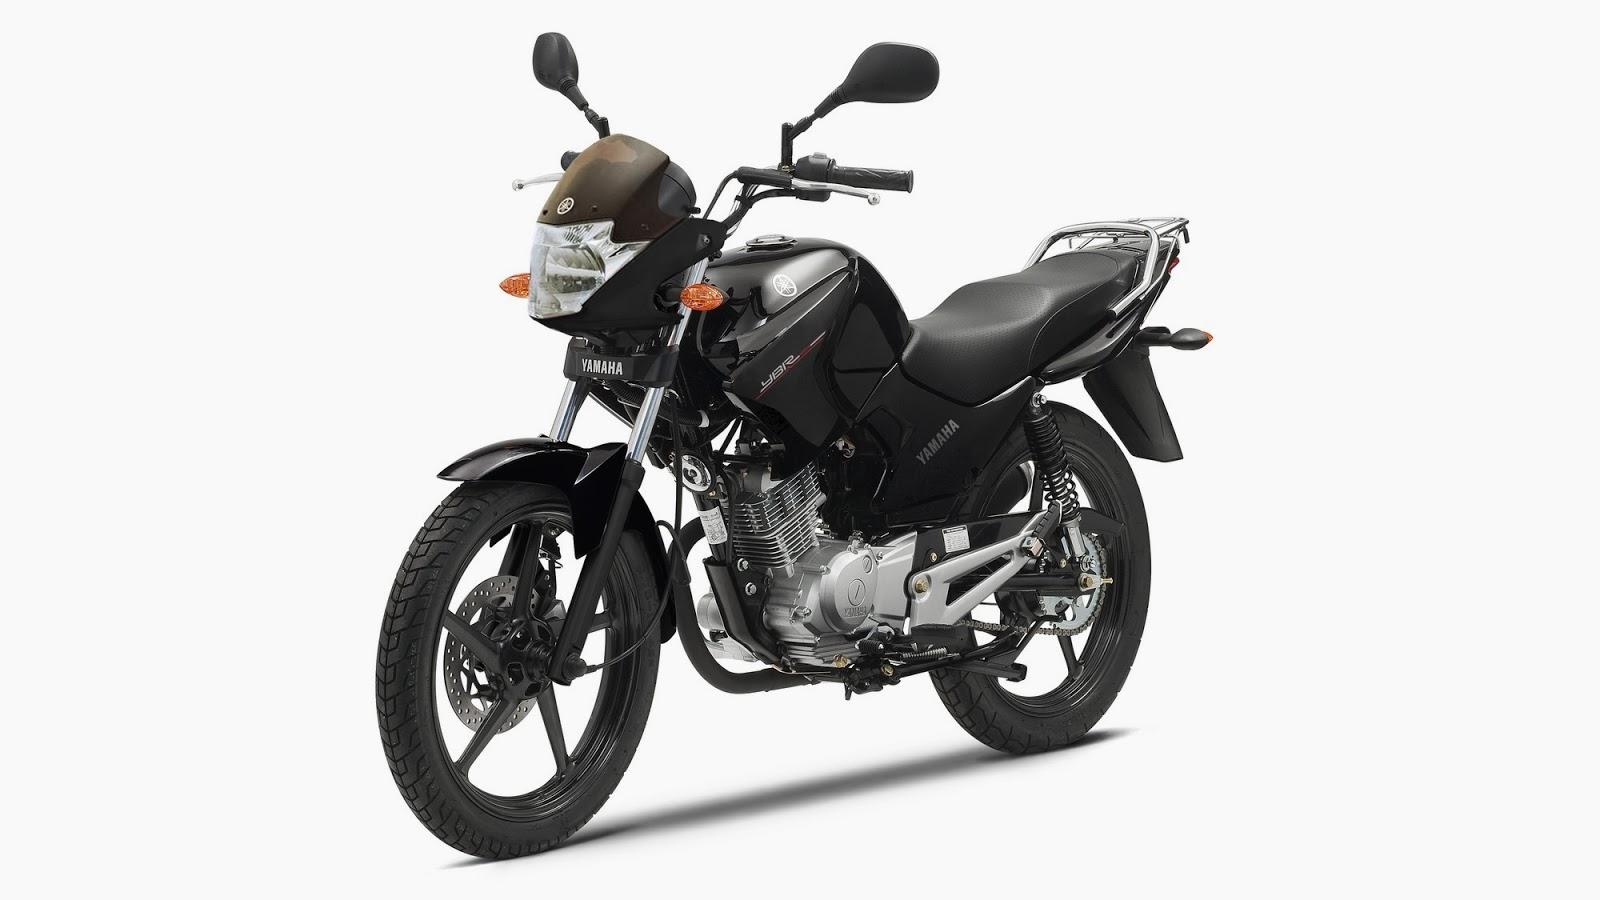 Yamaha Sport Roadster YBR 125 cc latets Bikes